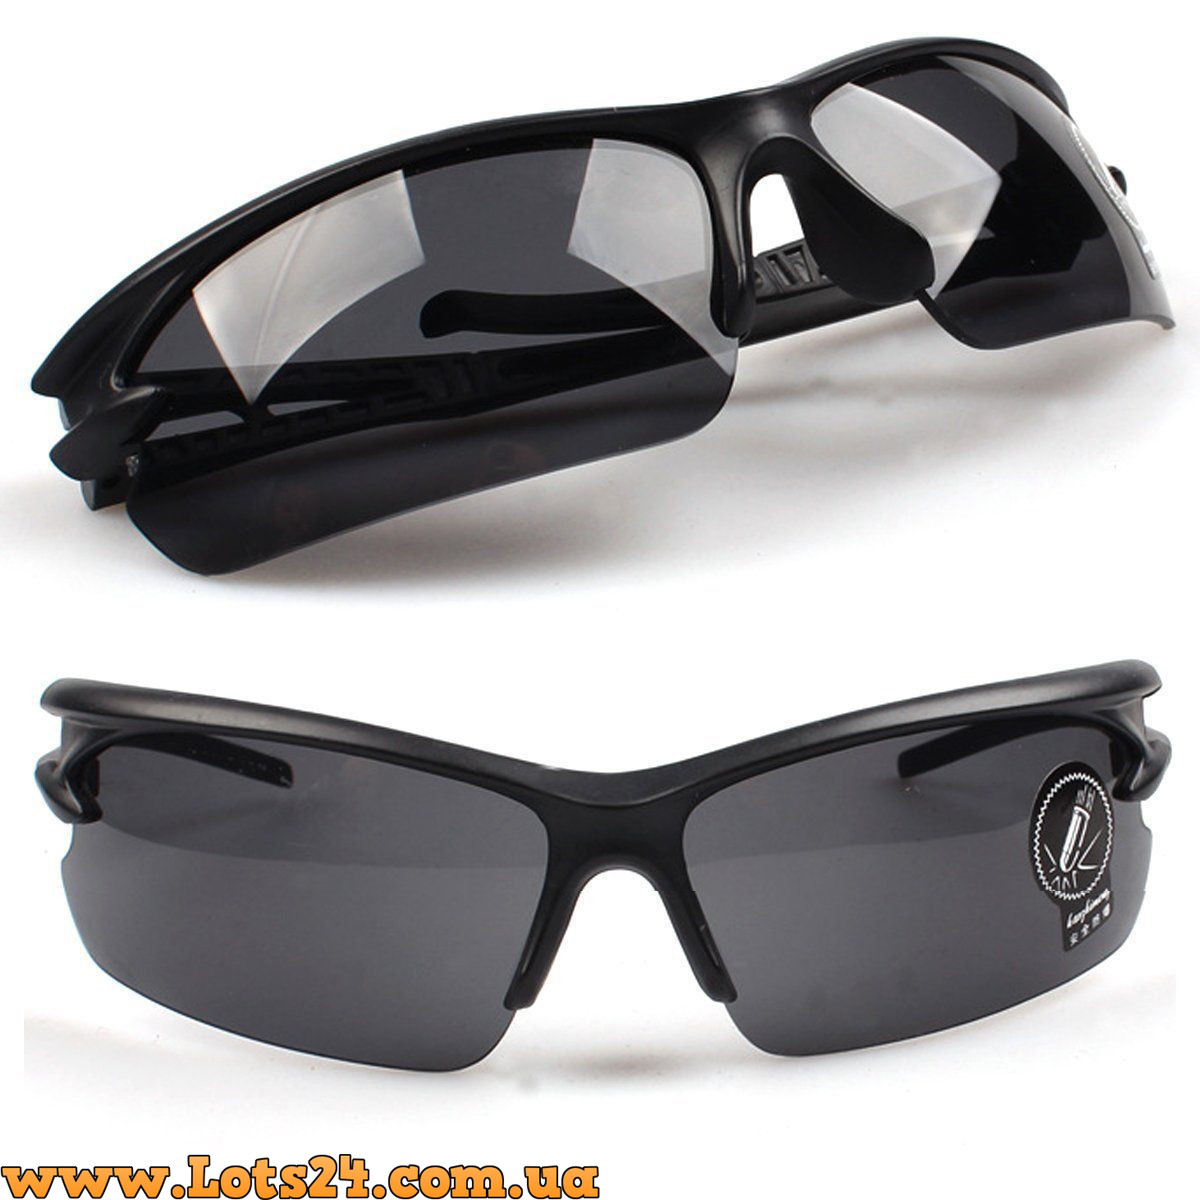 Солнцезащитные Вело-очки Oulaiou Alpha (оригинал 0c5d85ba25e48